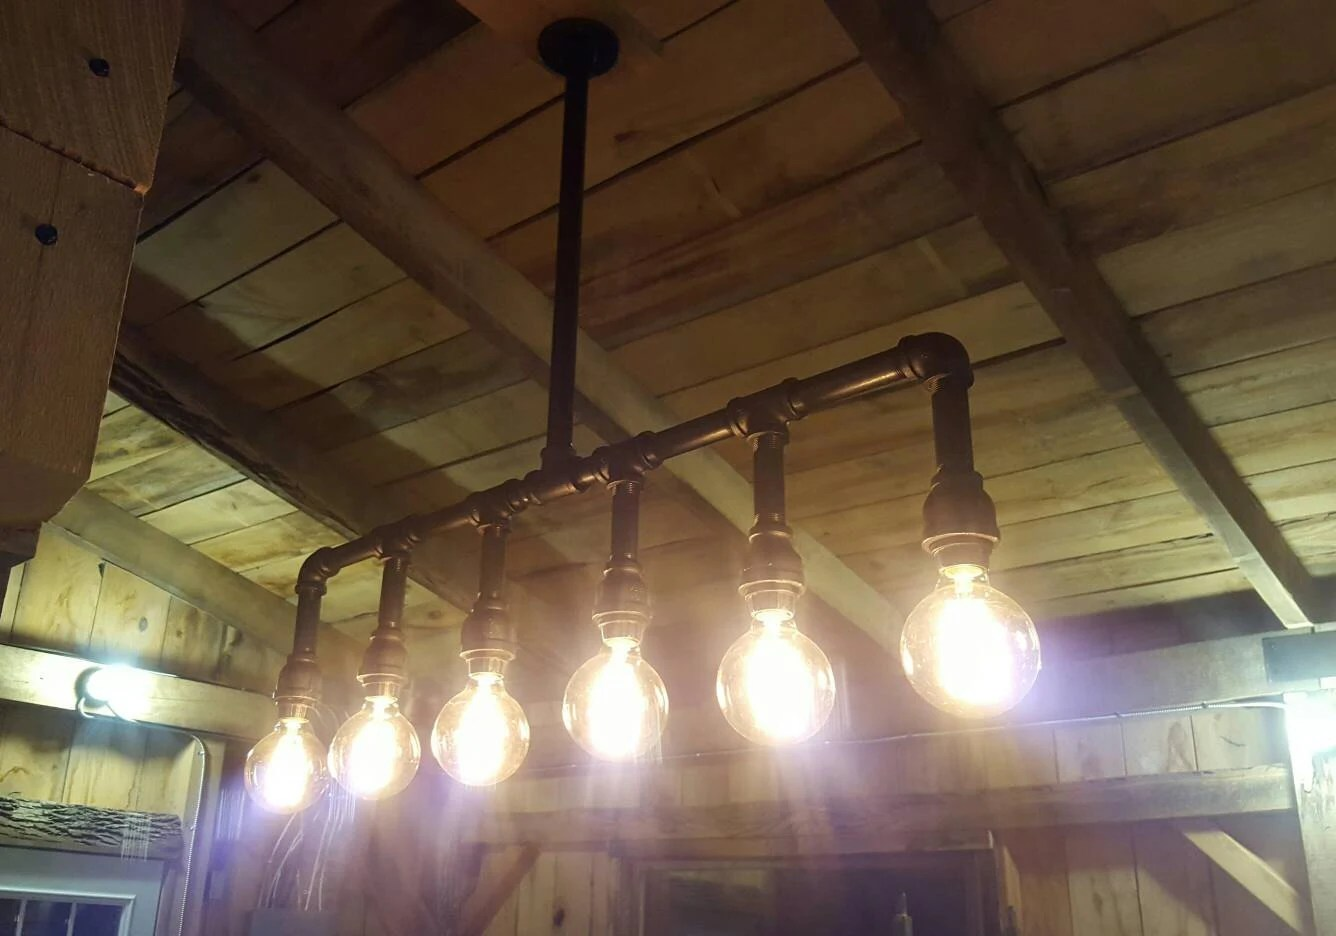 industrial lighting industrial kitchen lighting Industrial Lighting Rustic Kitchen Island Ceiling Light Modern Industrial Edison Bulb Kitchen Chandelier Farmhouse Lighting FREE SHIPPING